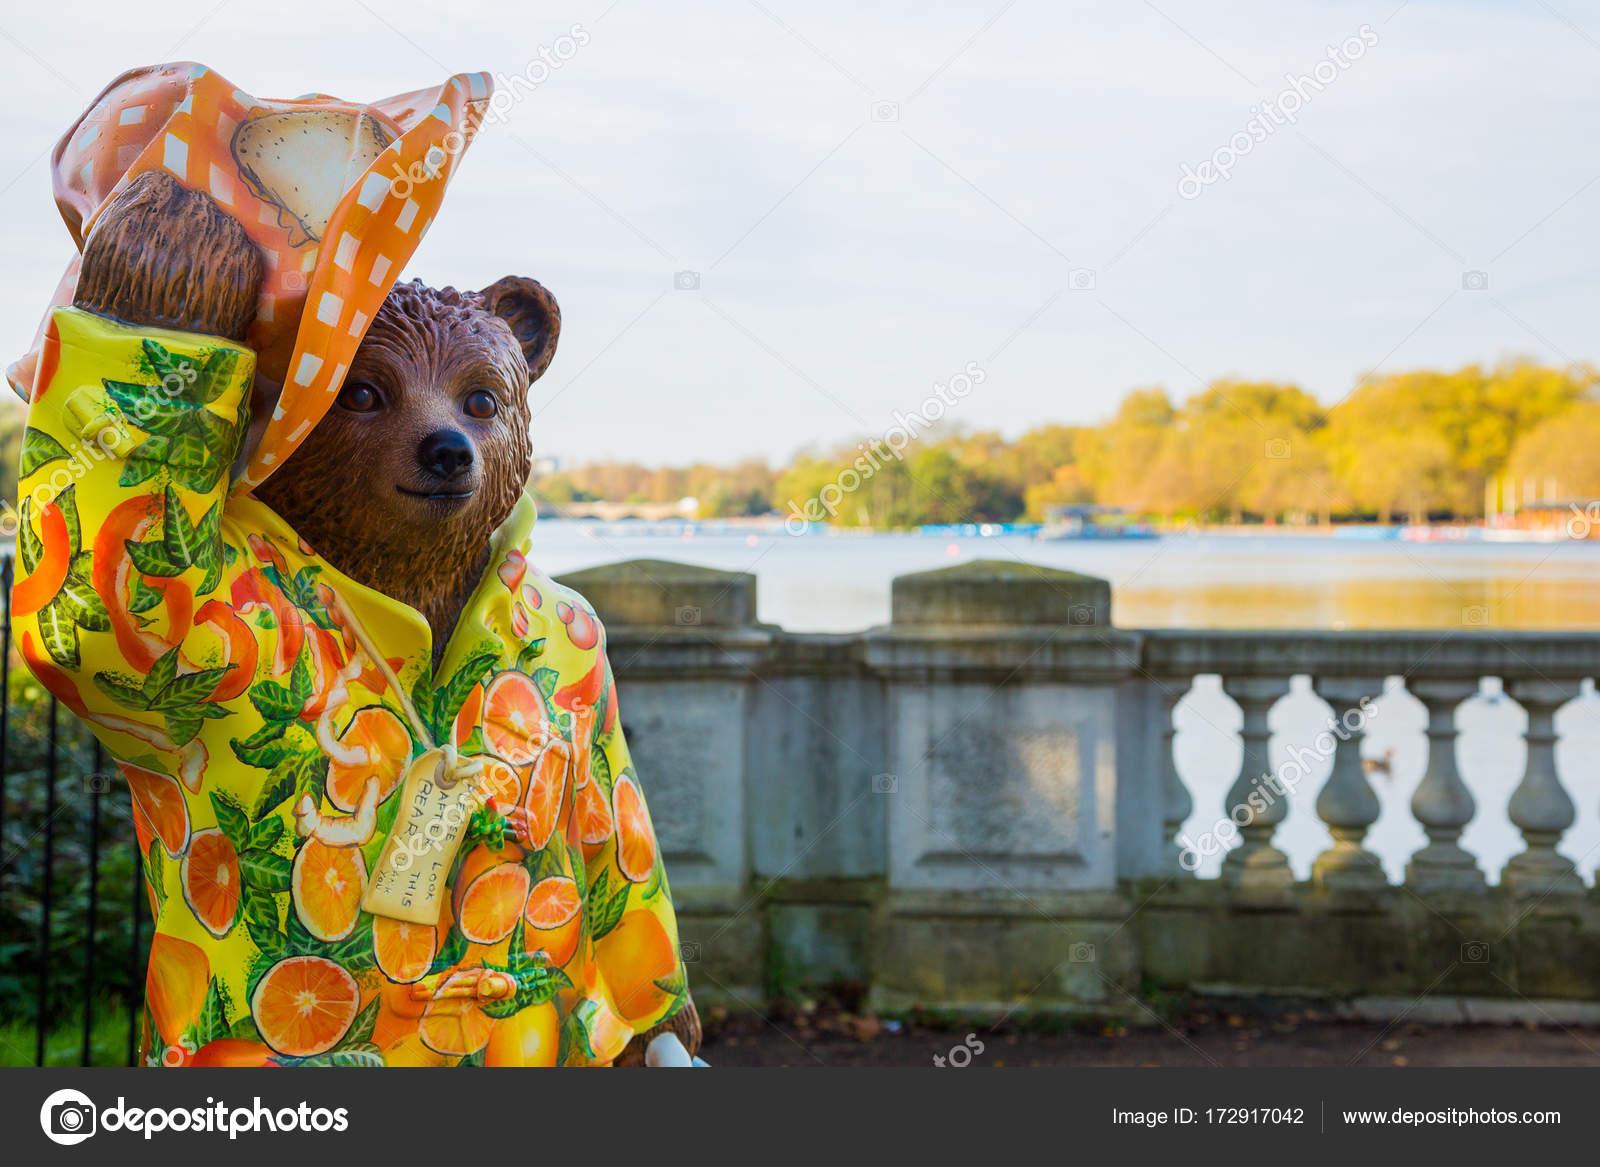 Paddington Bär Statue Stehend Hyde Park London Gruß Alle — Stockfoto ...